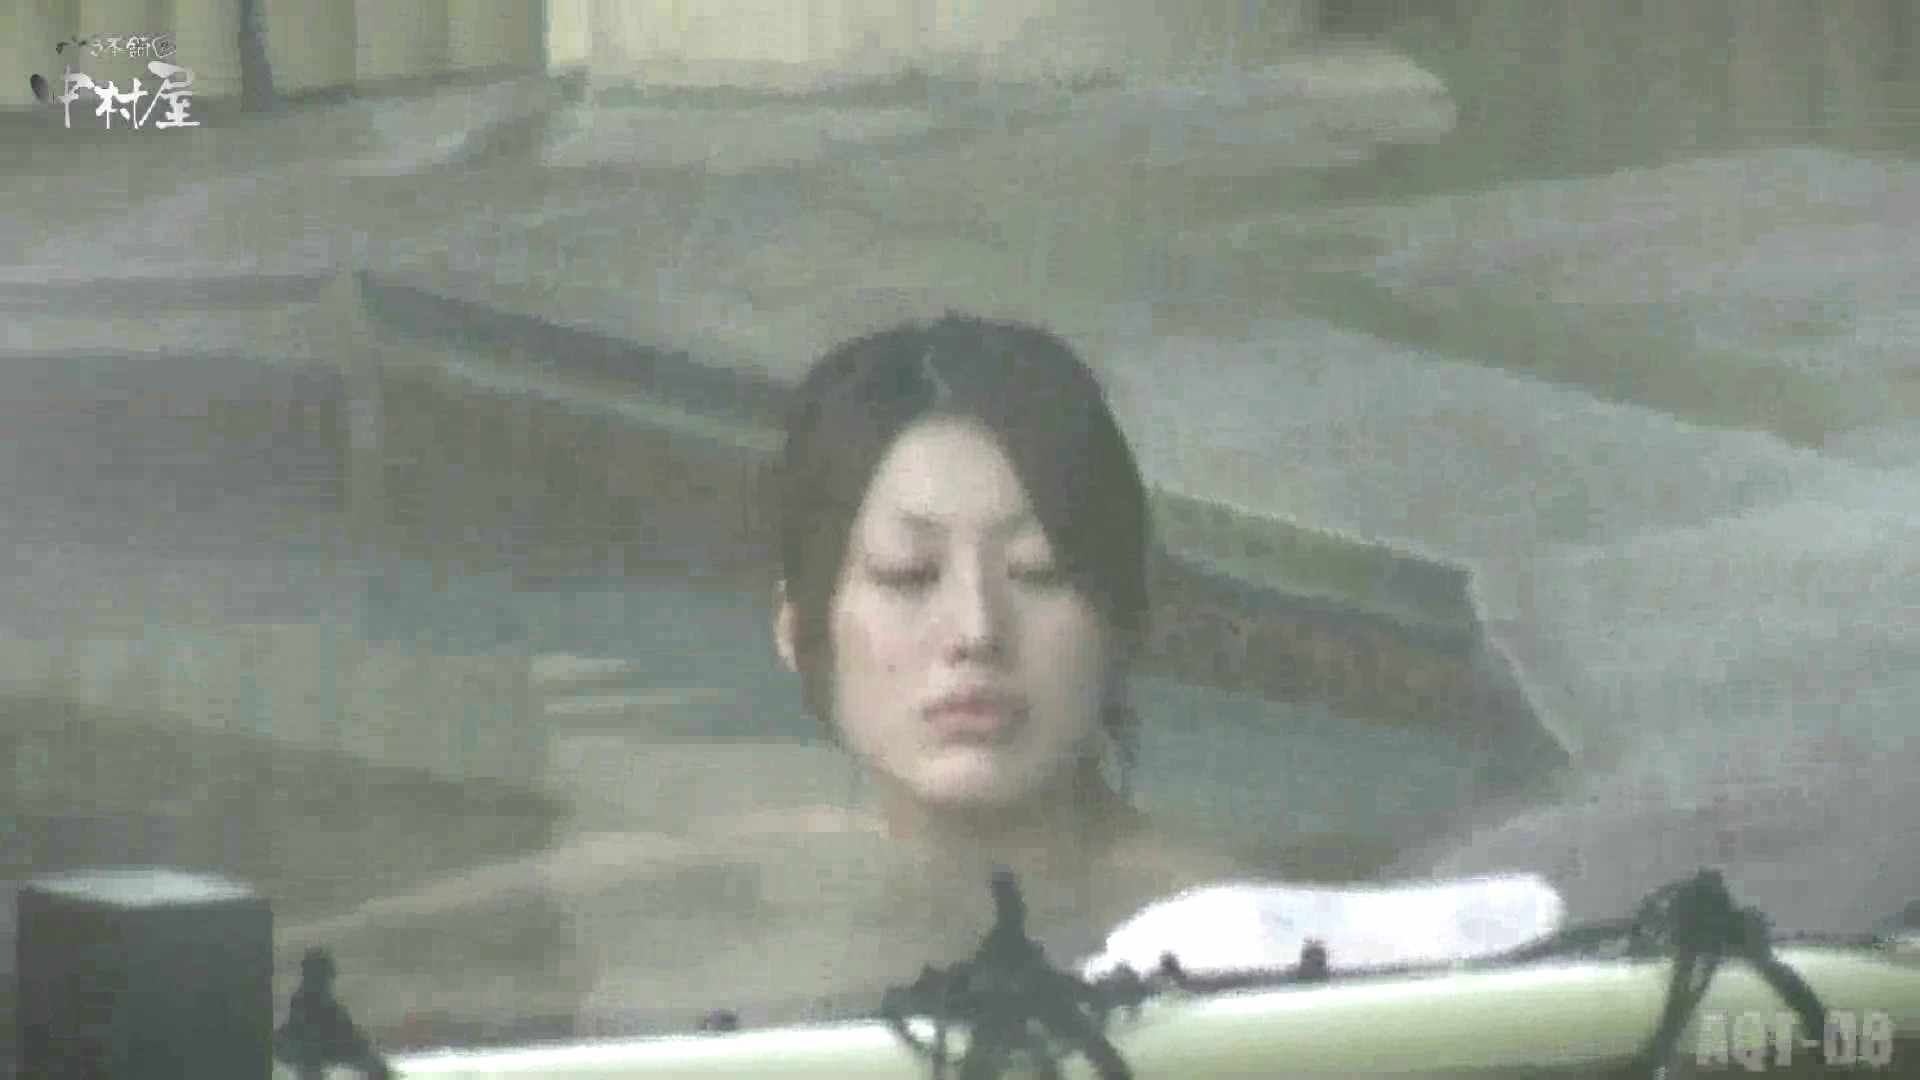 Aquaな露天風呂Vol.872潜入盗撮露天風呂八判湯 其の三 盗撮特集 | 潜入画像  96画像 67